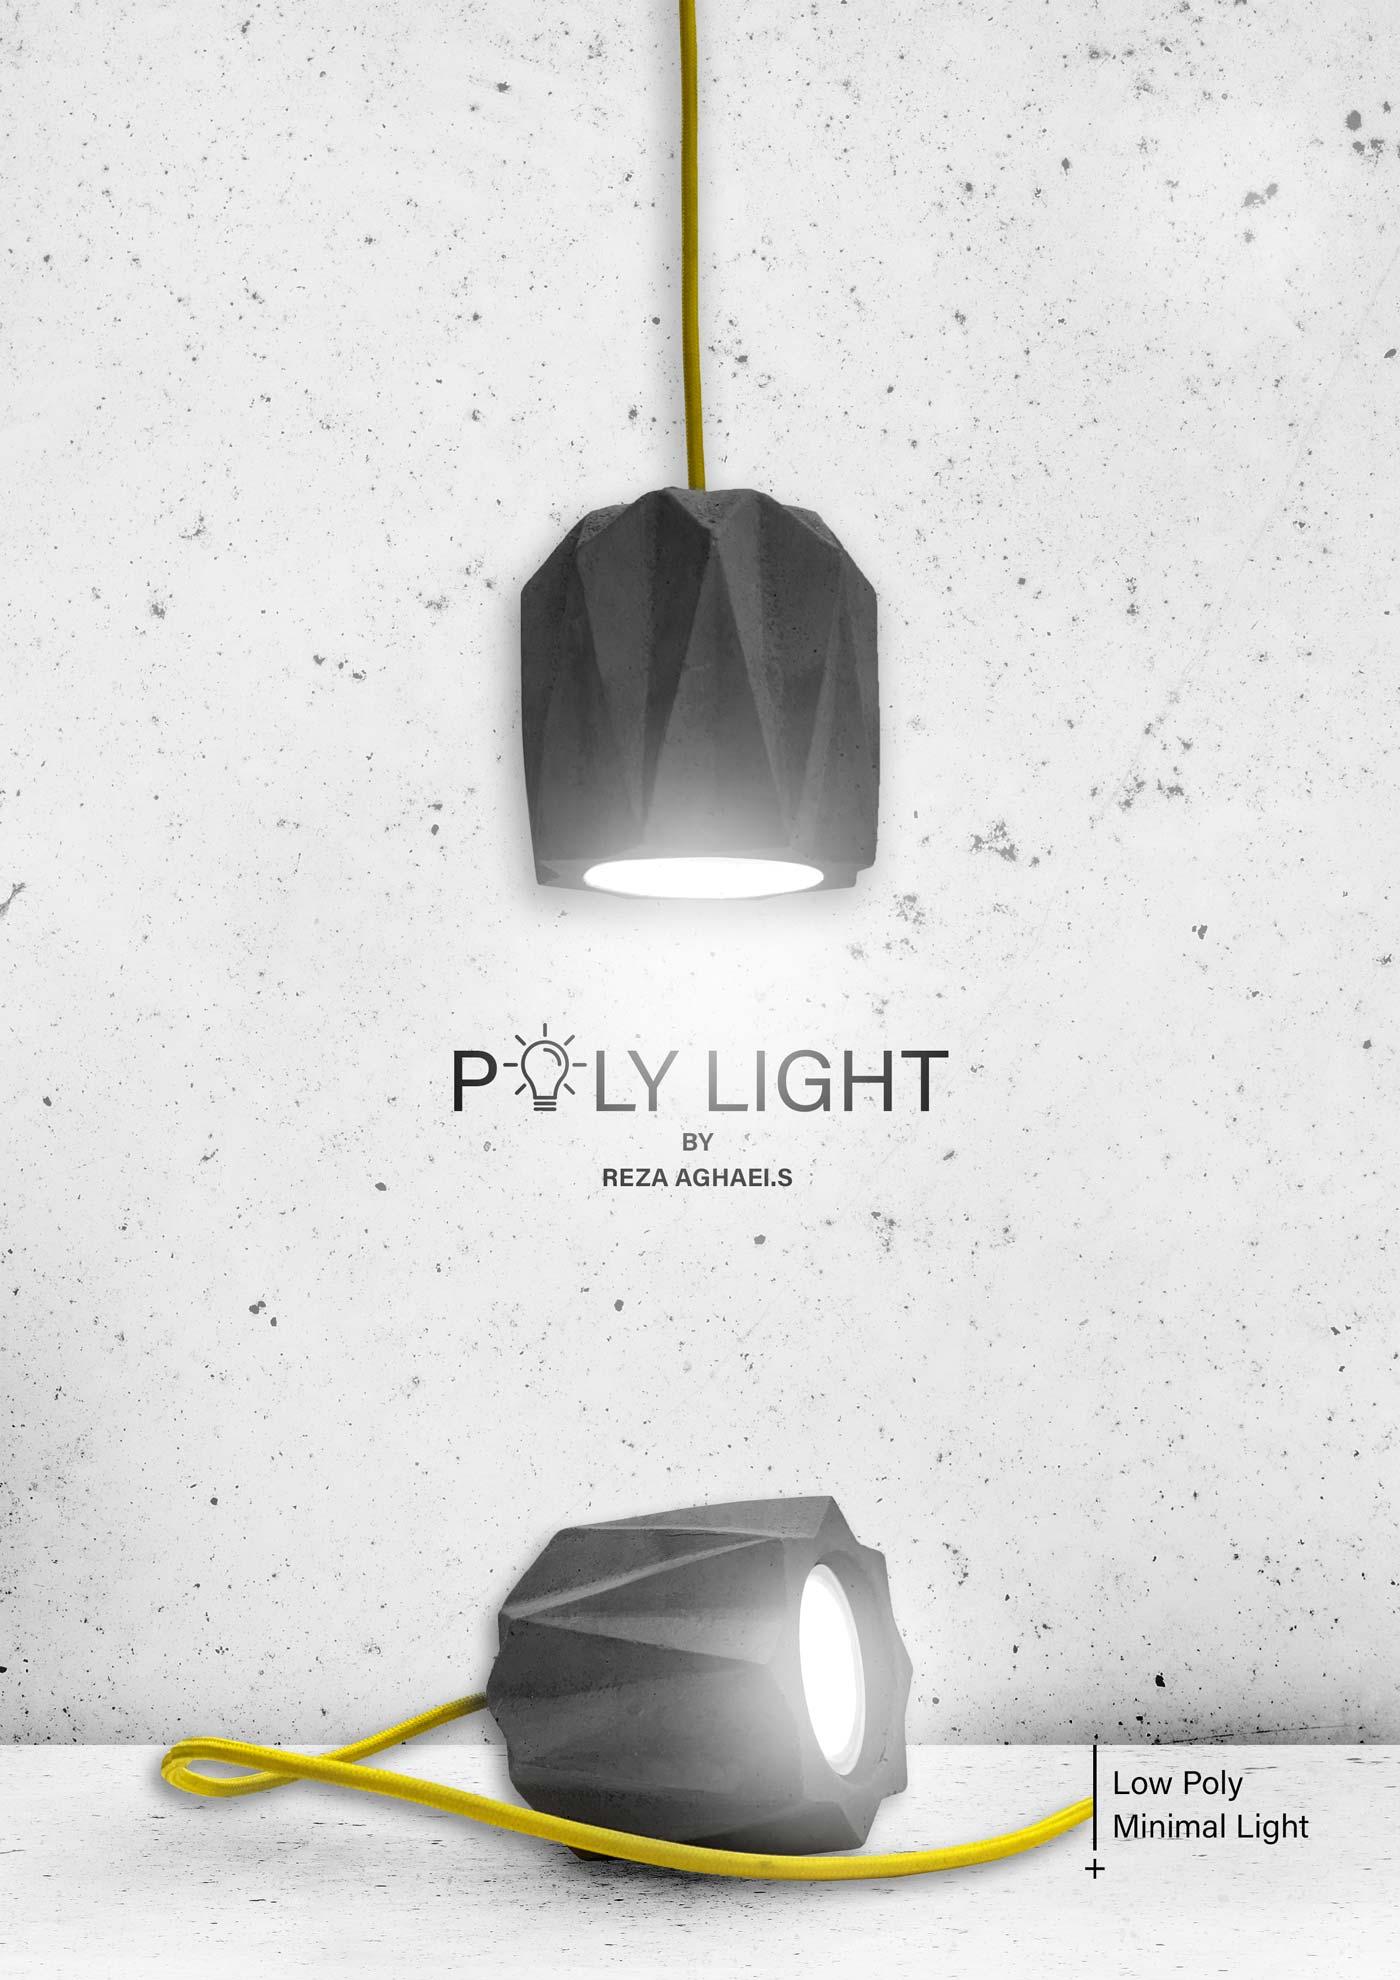 POLYLIGHT